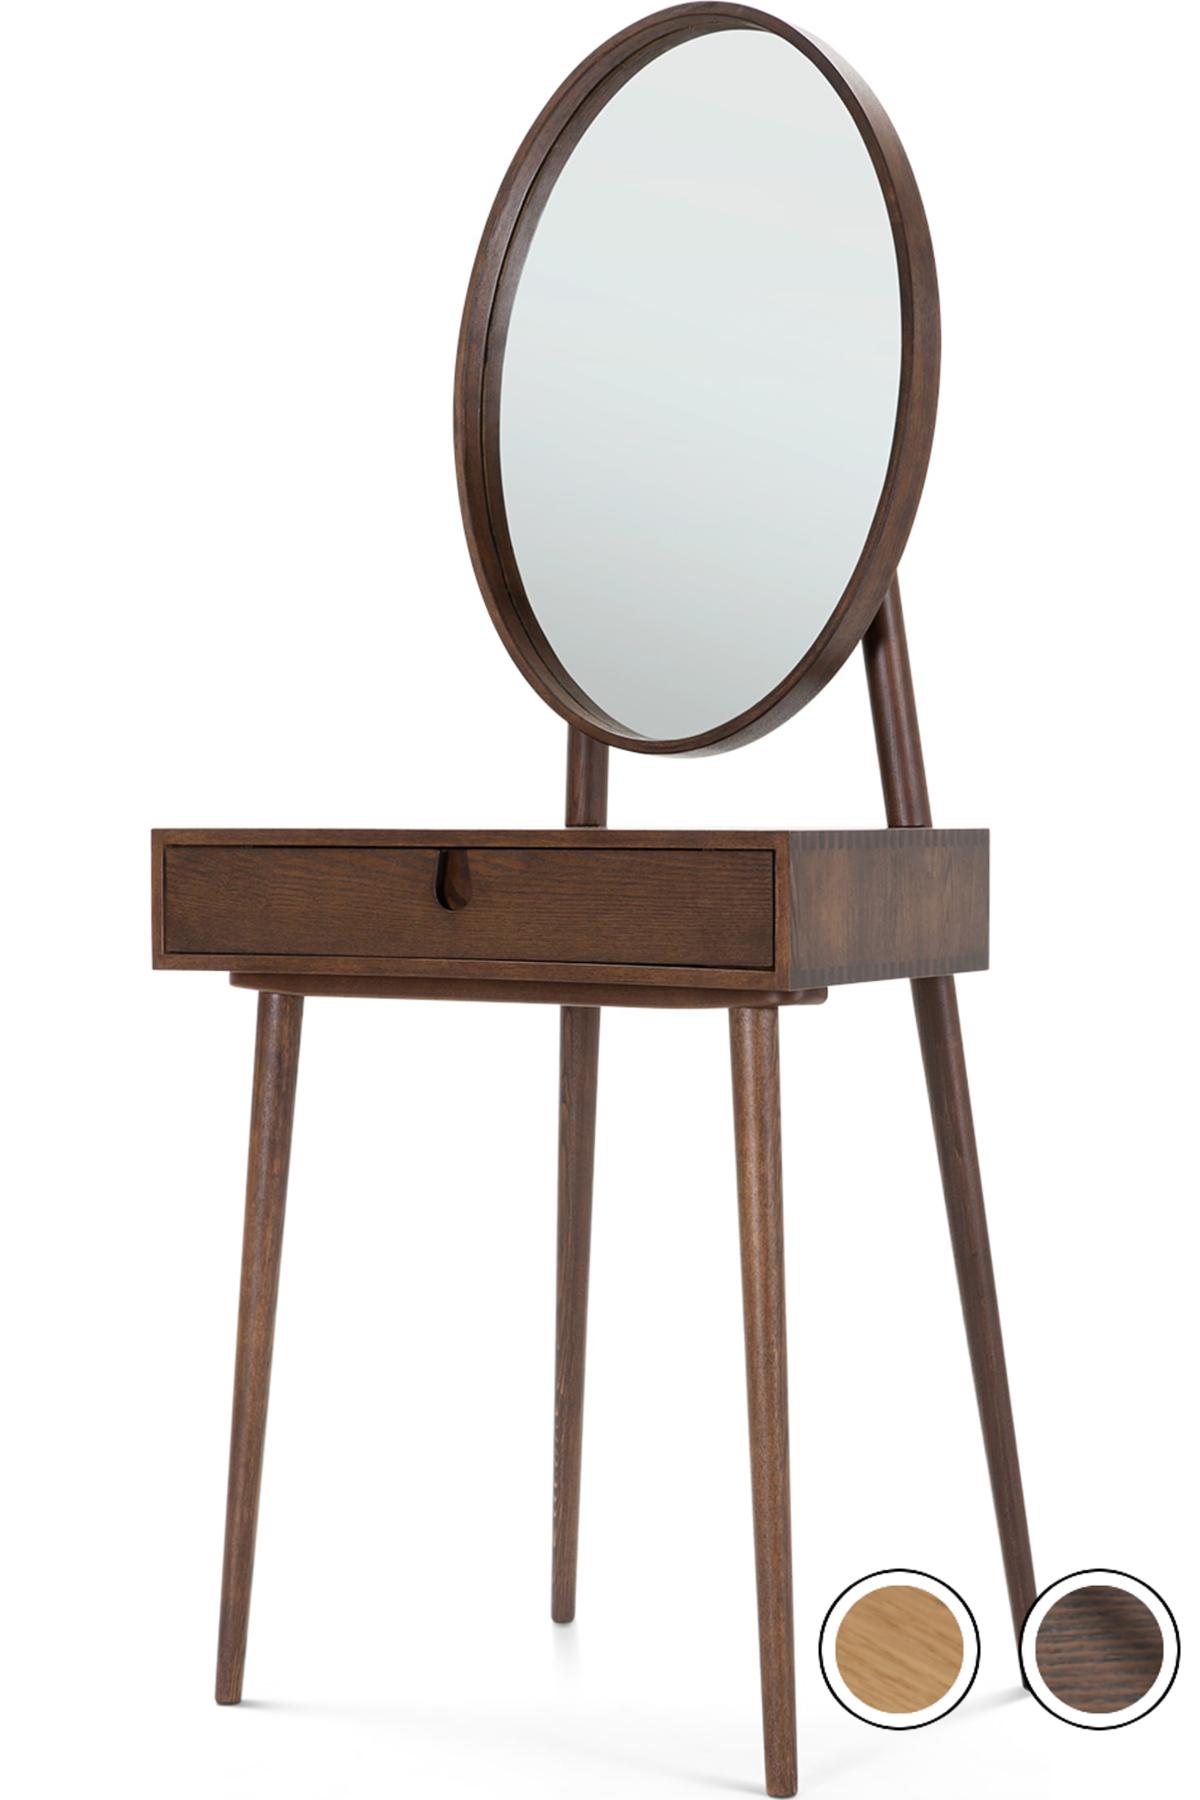 56 Ideas Makeup Vanity Ideas Dark Wood Makeup Modern Small Desk